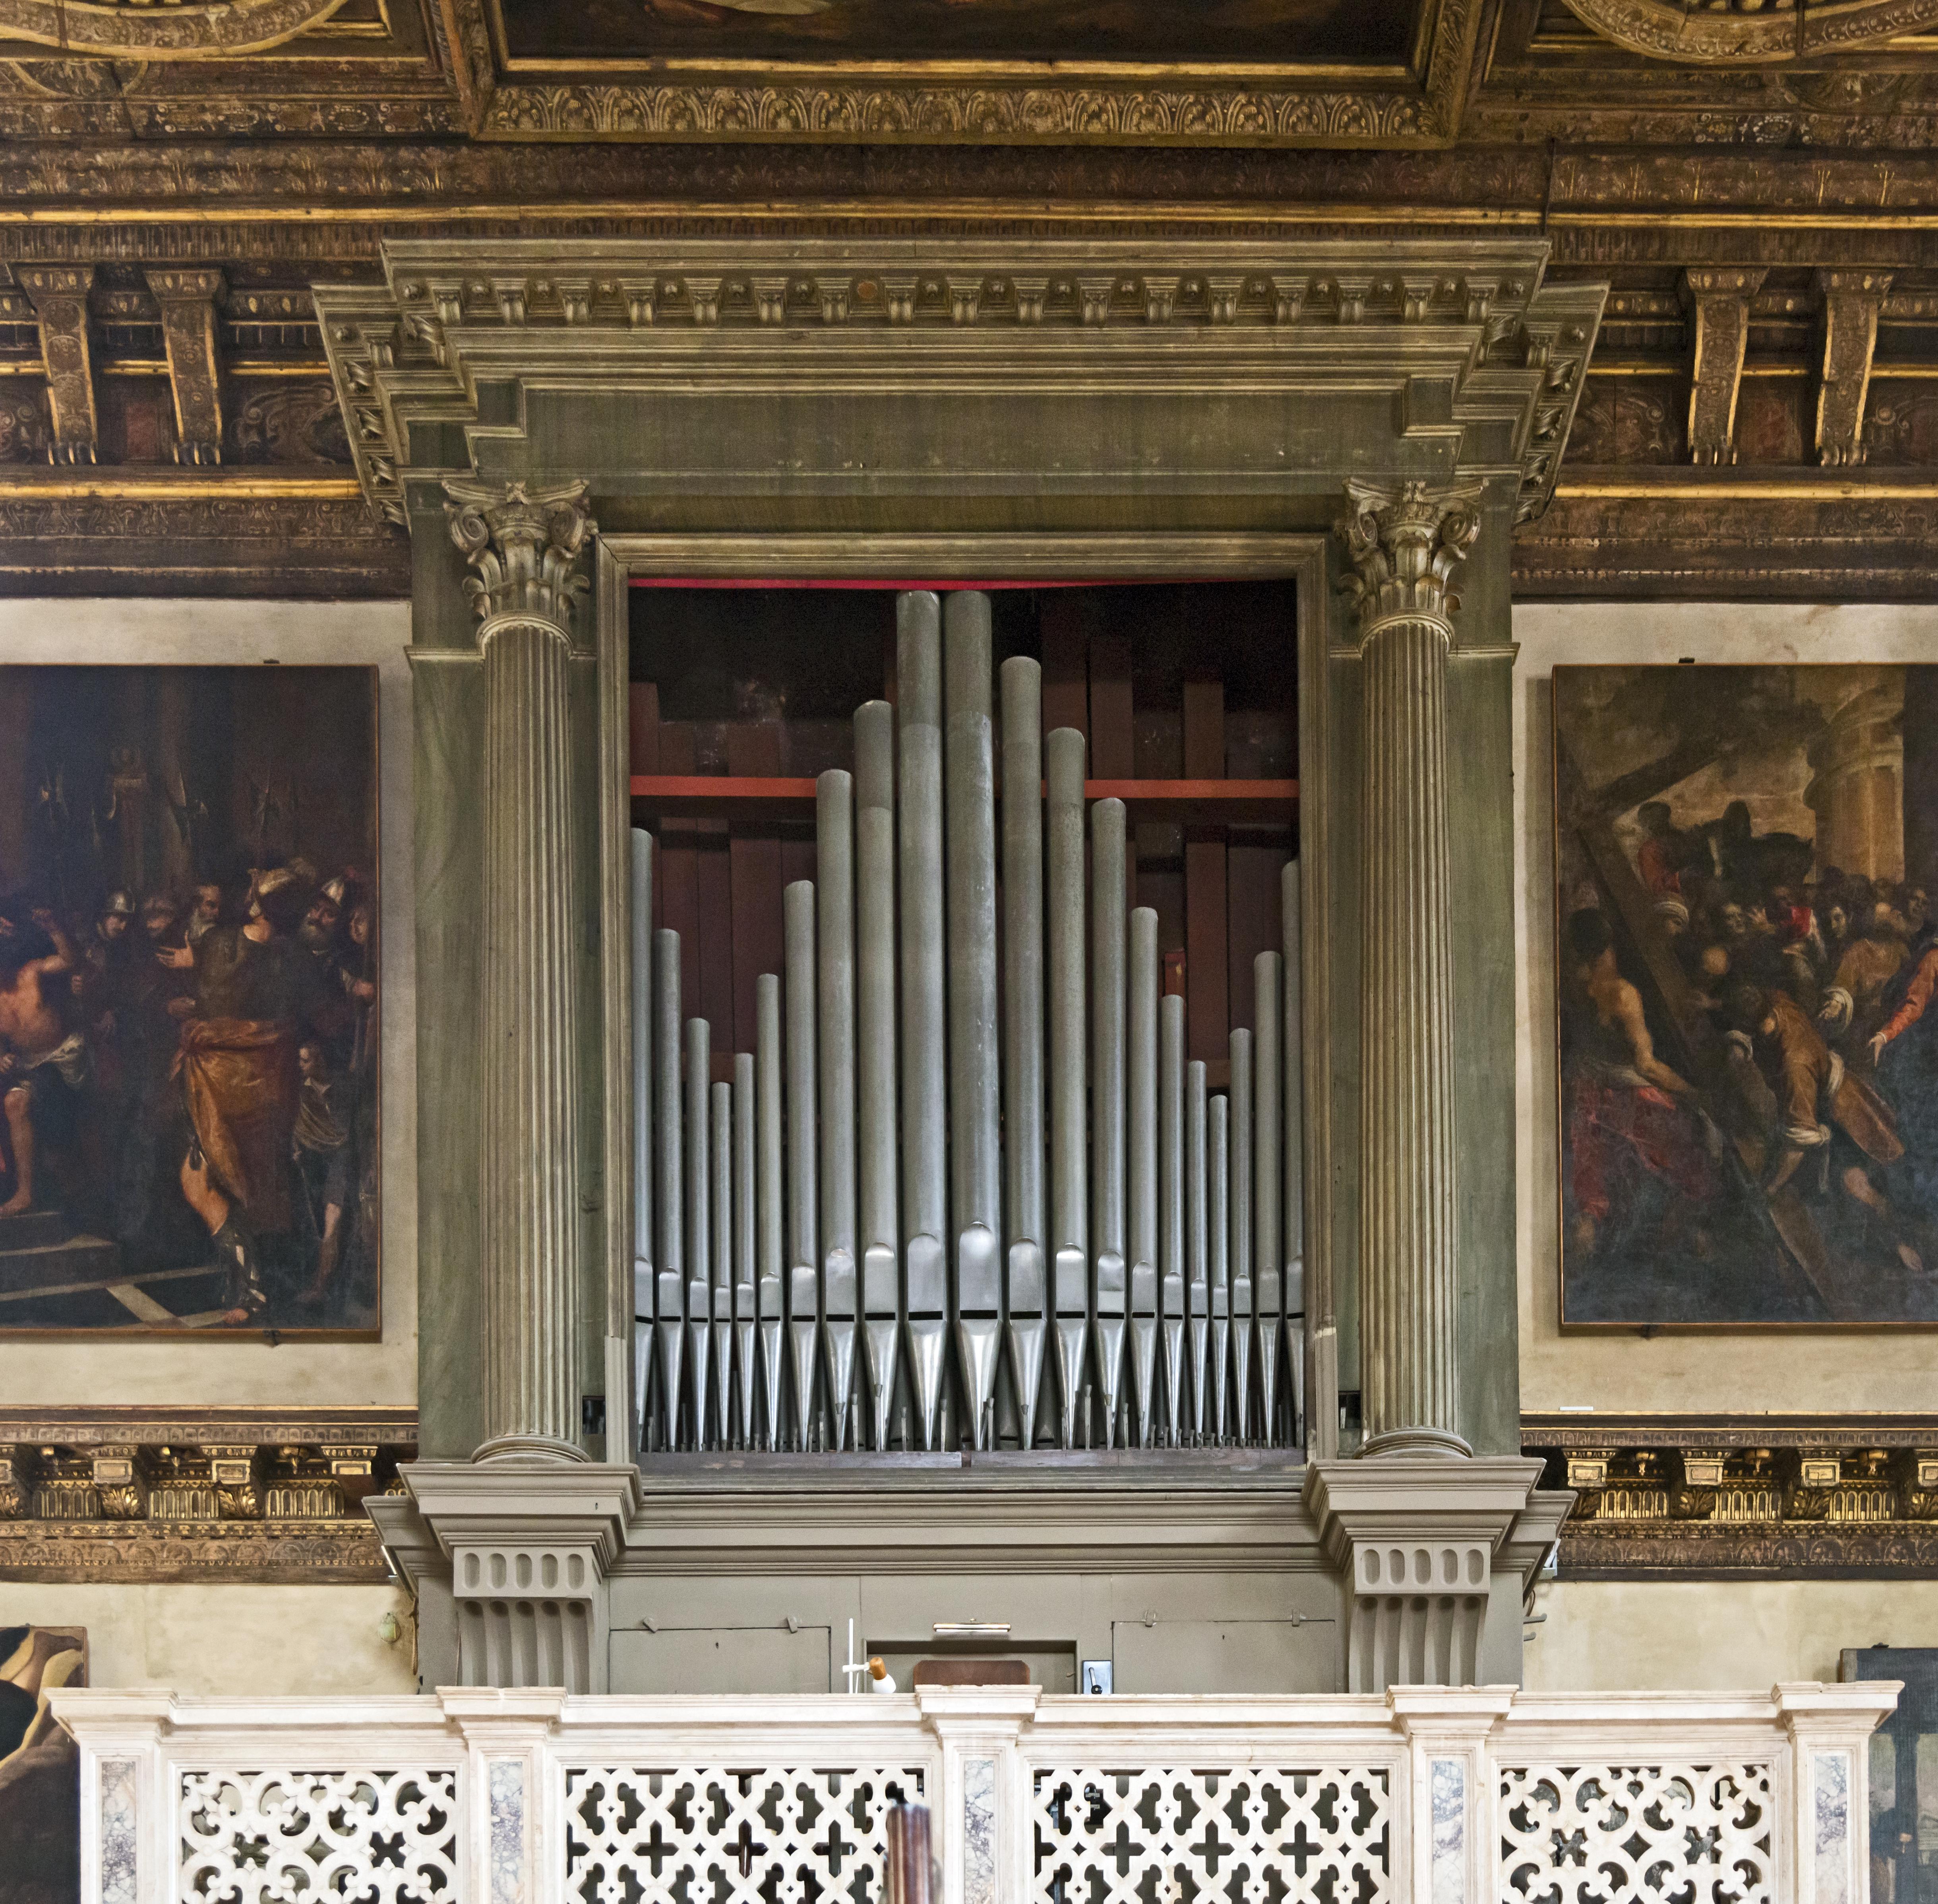 organo Chiesa_di_San_Zulian_-_Organo.jpg